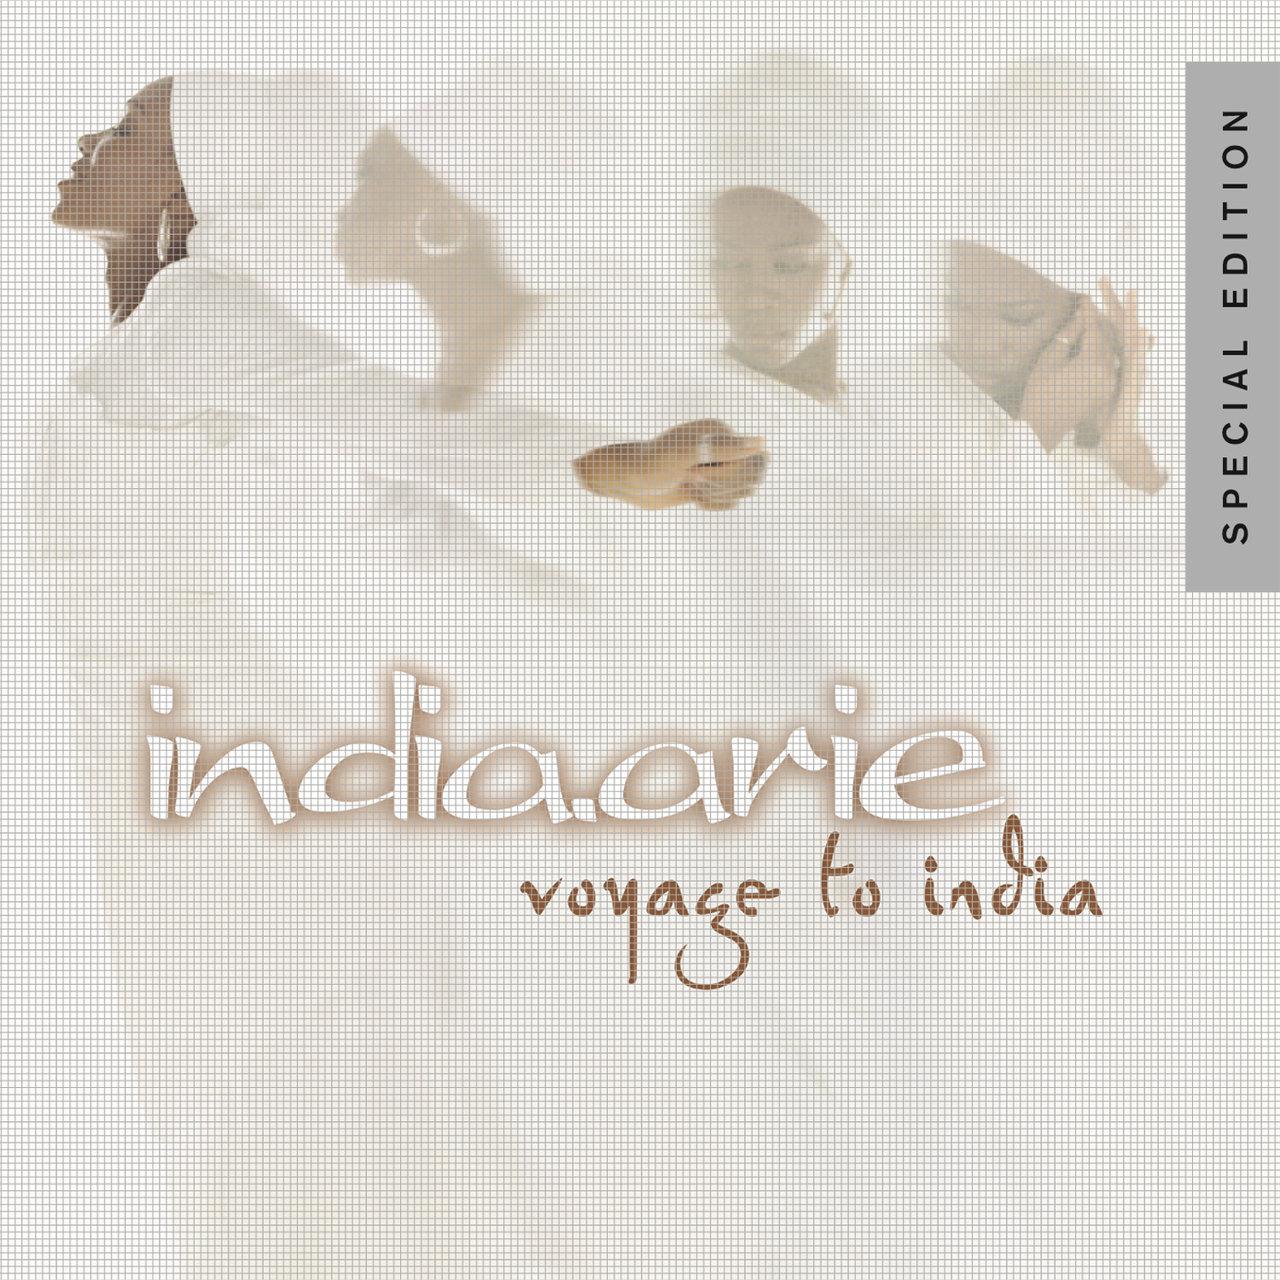 TIDAL: Listen to India.Arie on TIDAL